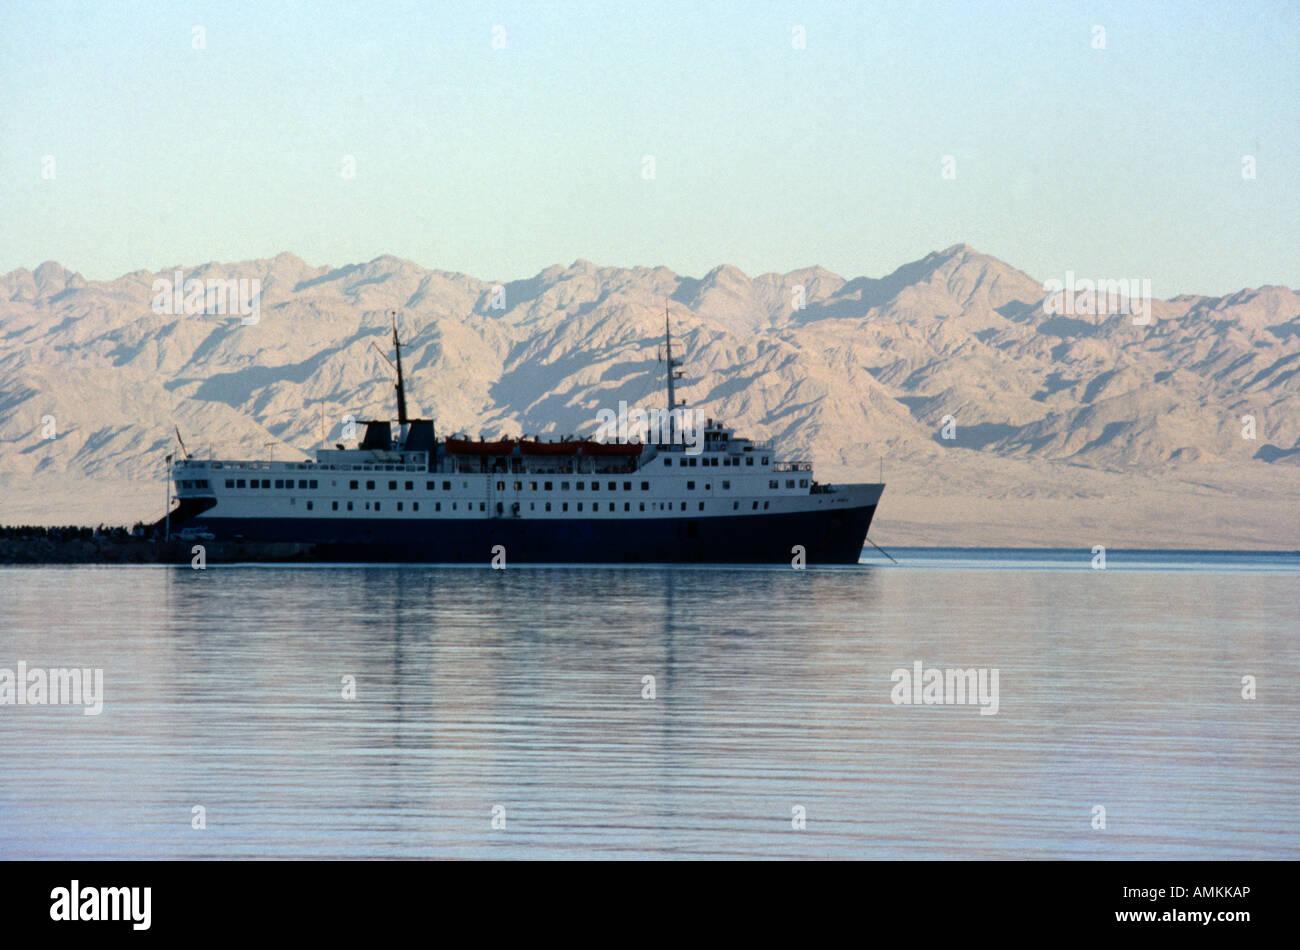 Sinai Egypt Nuweiba Farah II Ferry Boat - Stock Image